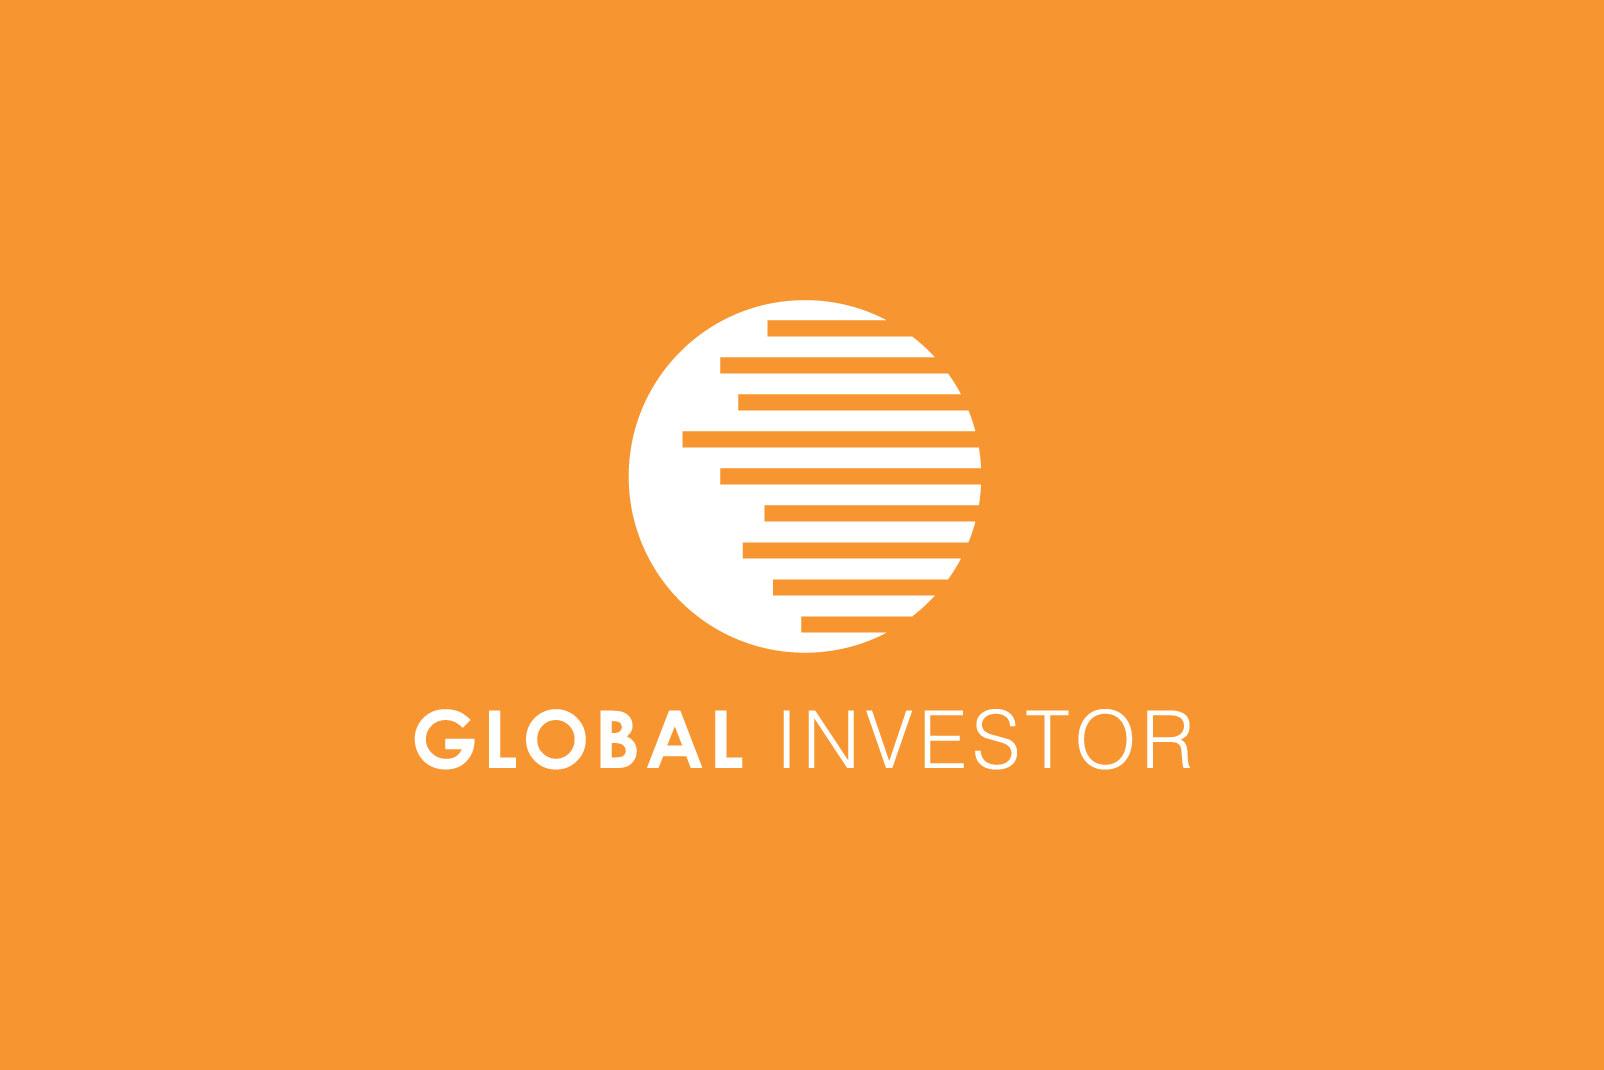 THIẾT KẾ LOGO CÔNG TY GLOBAL INVESTOR